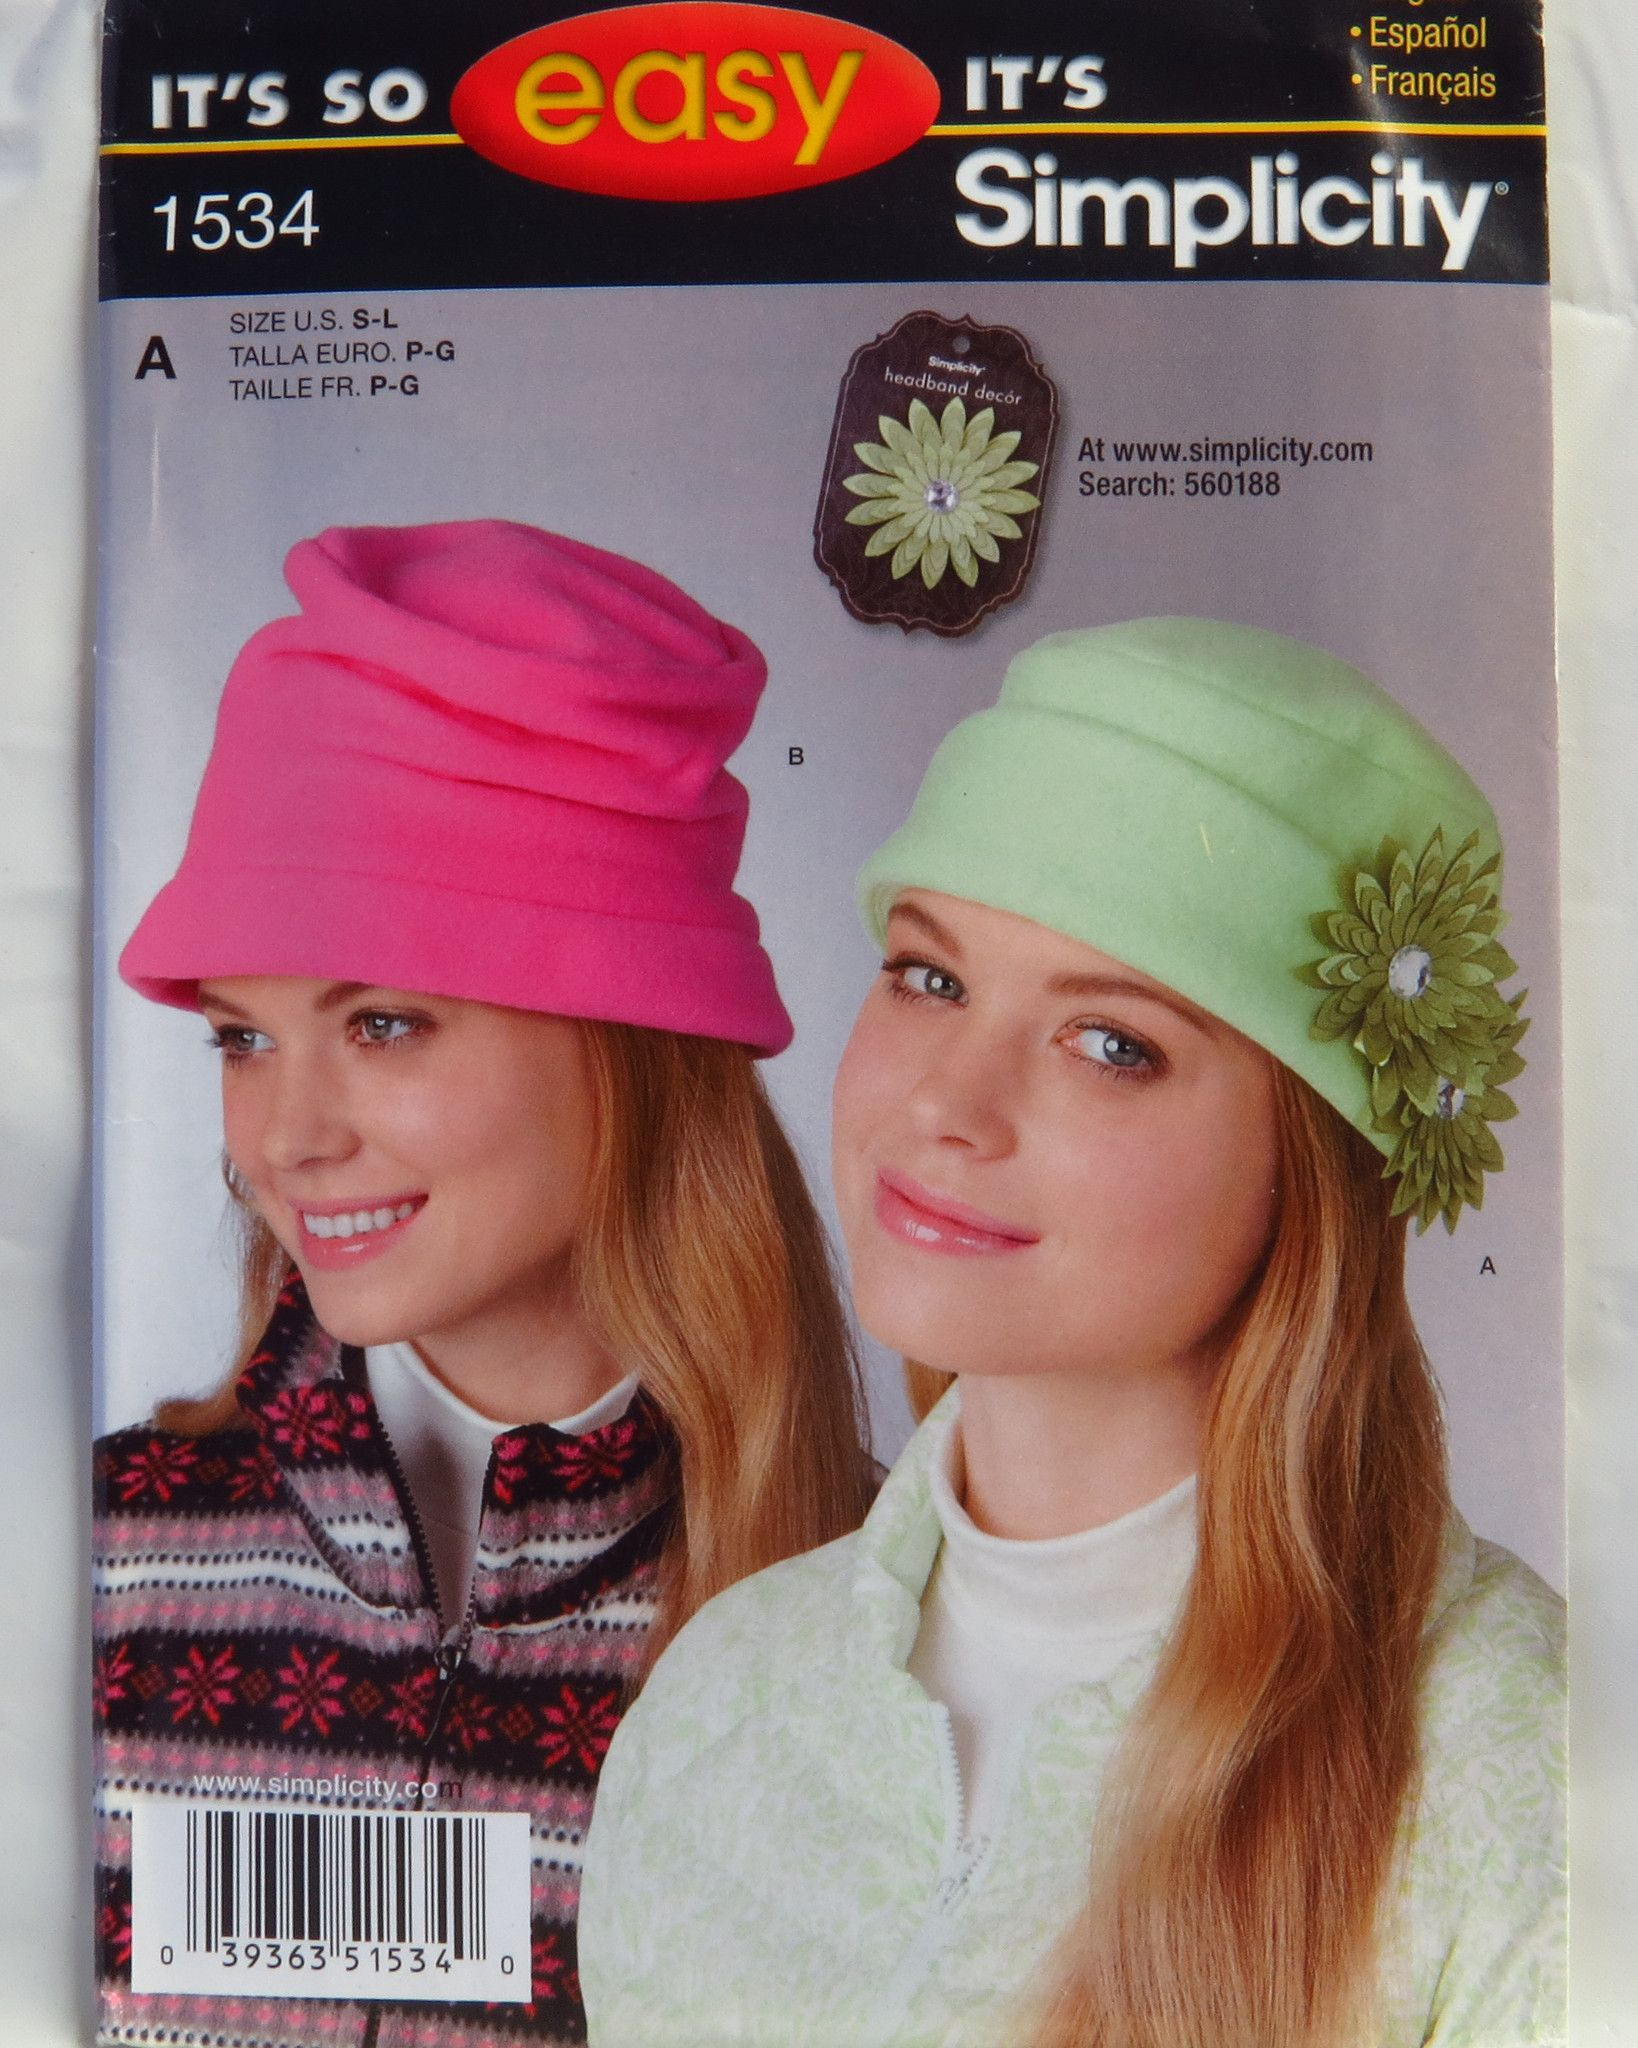 Simplicity 1534 Misses\' Fleece Hats | Hüte und Mütze